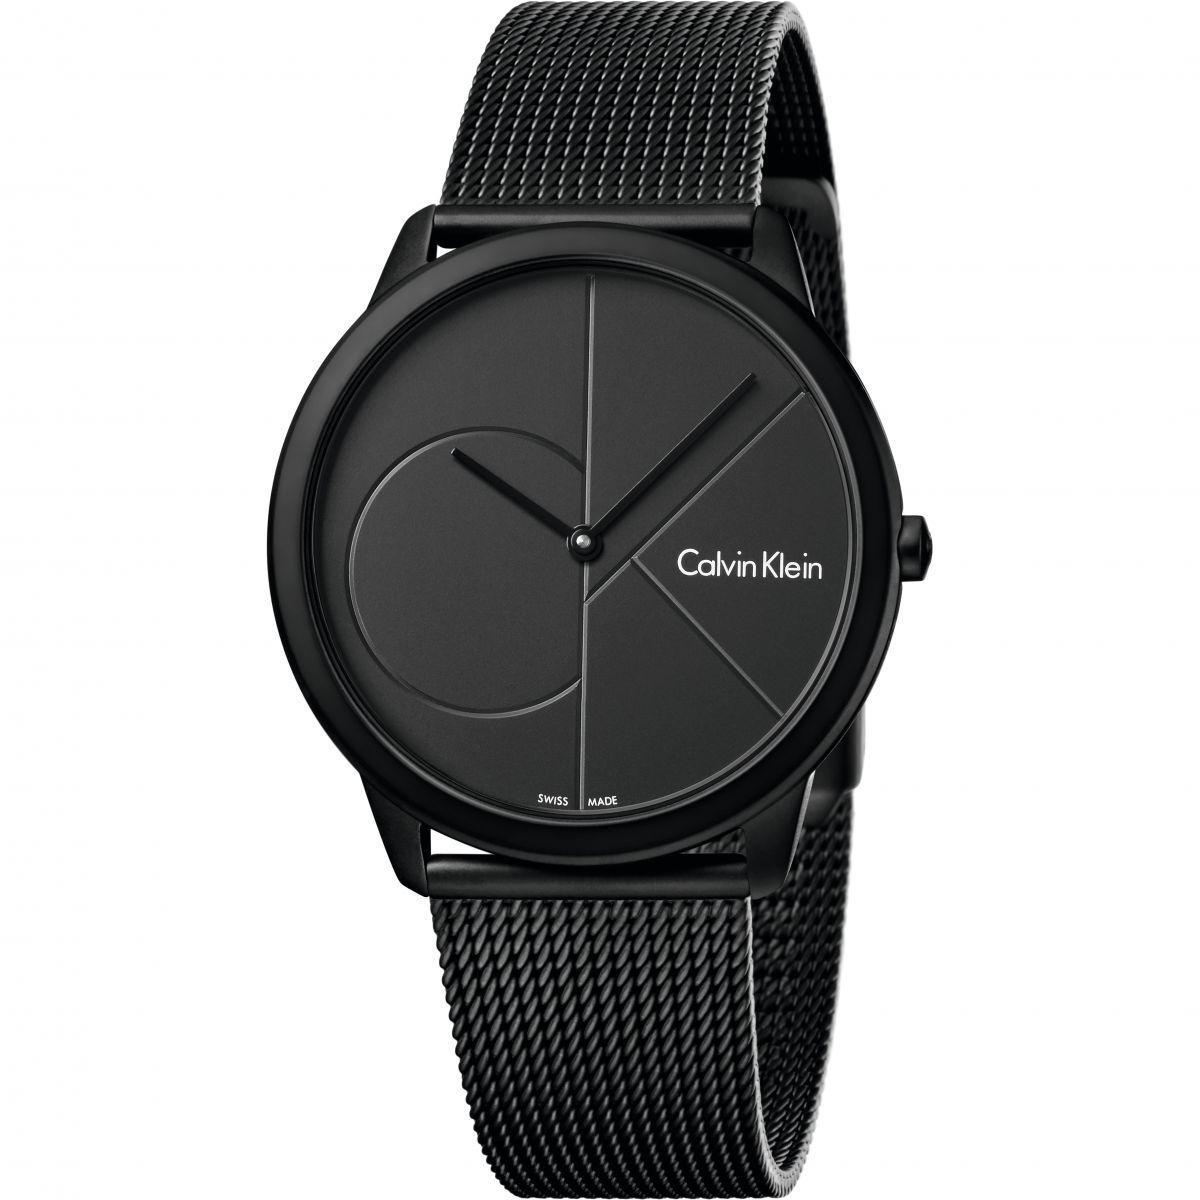 52ea333d0a12 Reloj Calvin Klein Minimal K3m514b1 Unisex